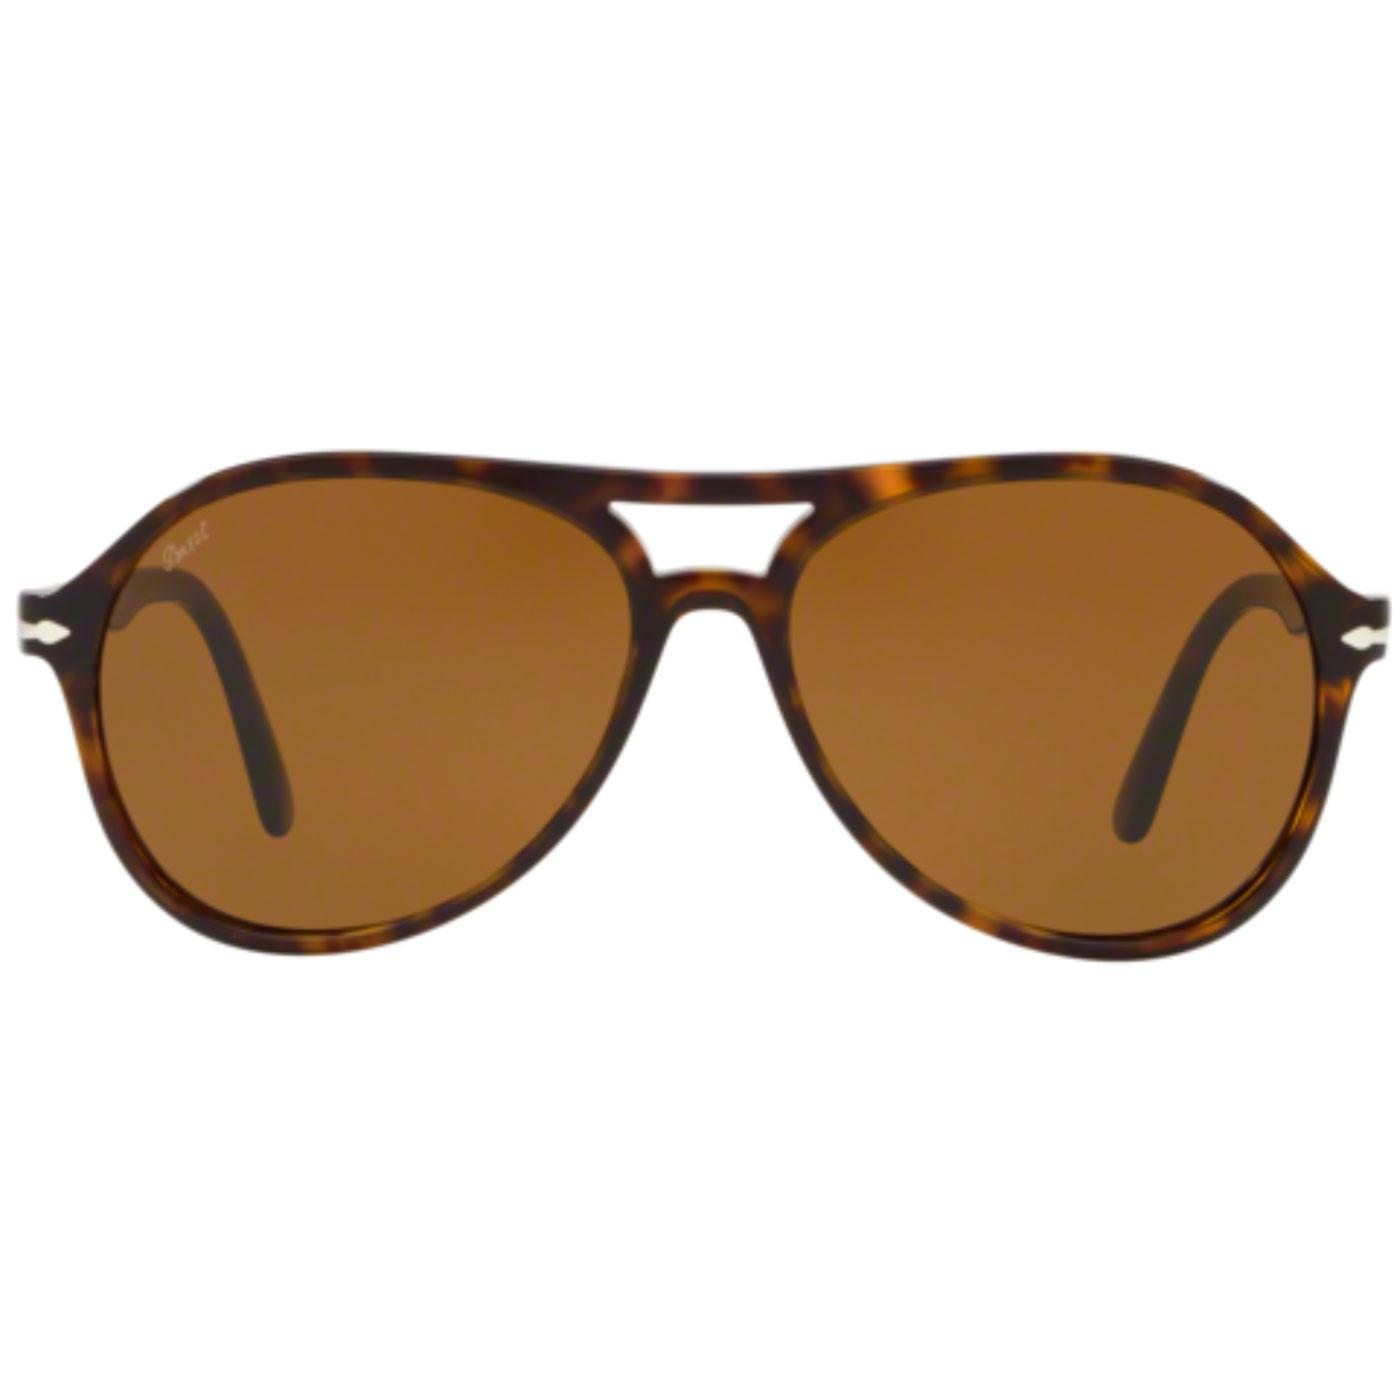 PERSOL Men's Retro 70s Aviator Sunglasses - Havana